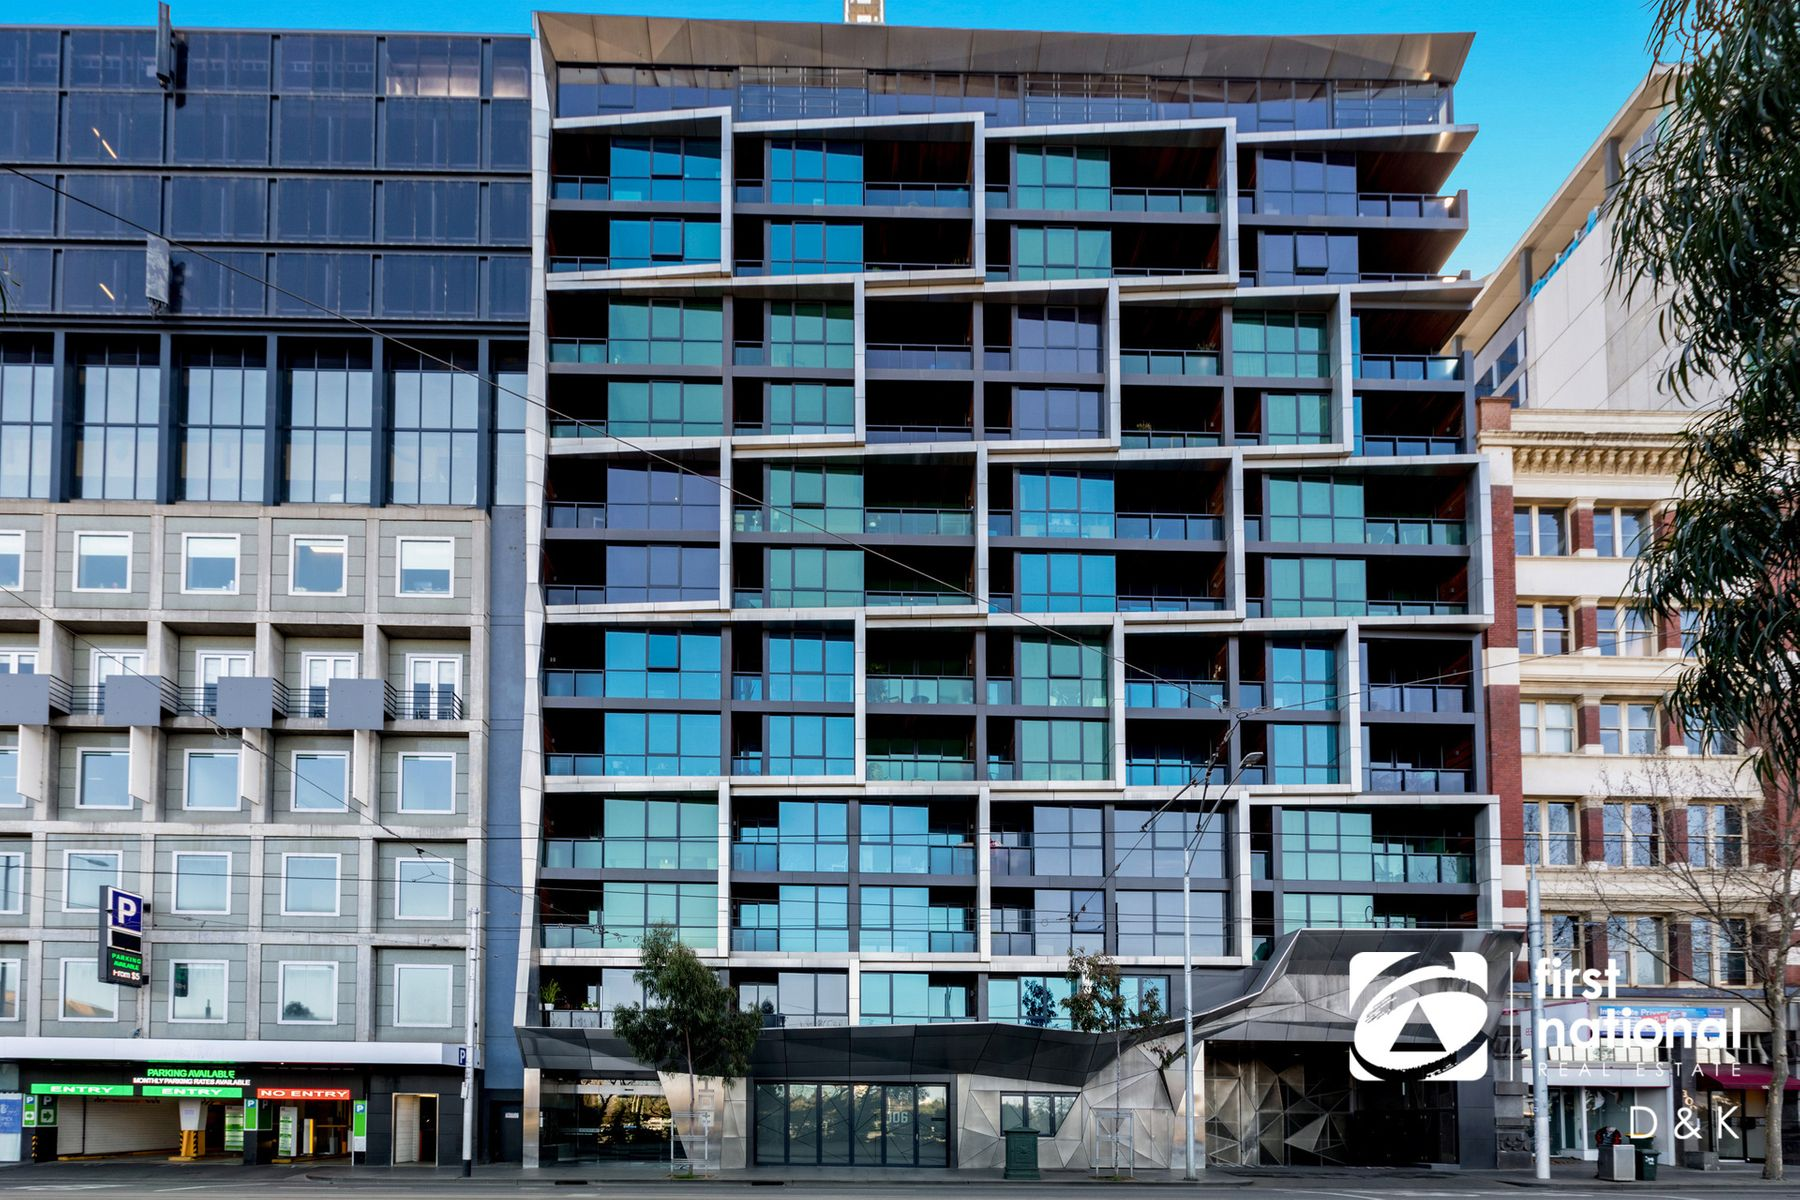 112/108 Flinders Street, Melbourne, VIC 3000